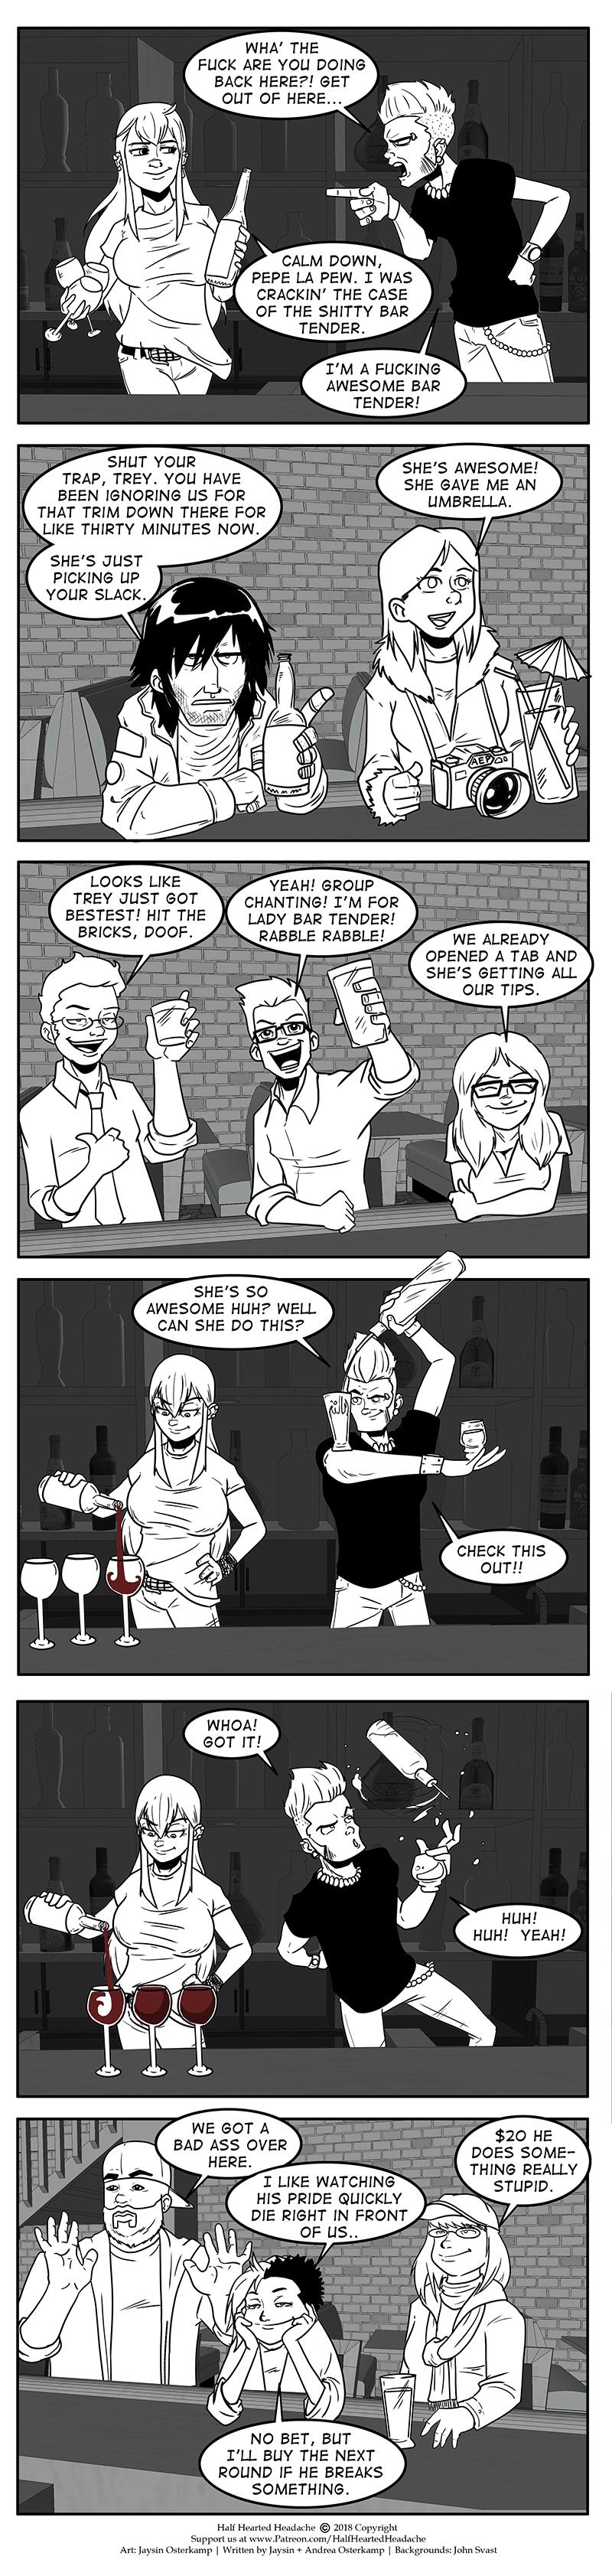 487 – Awesome Bartender